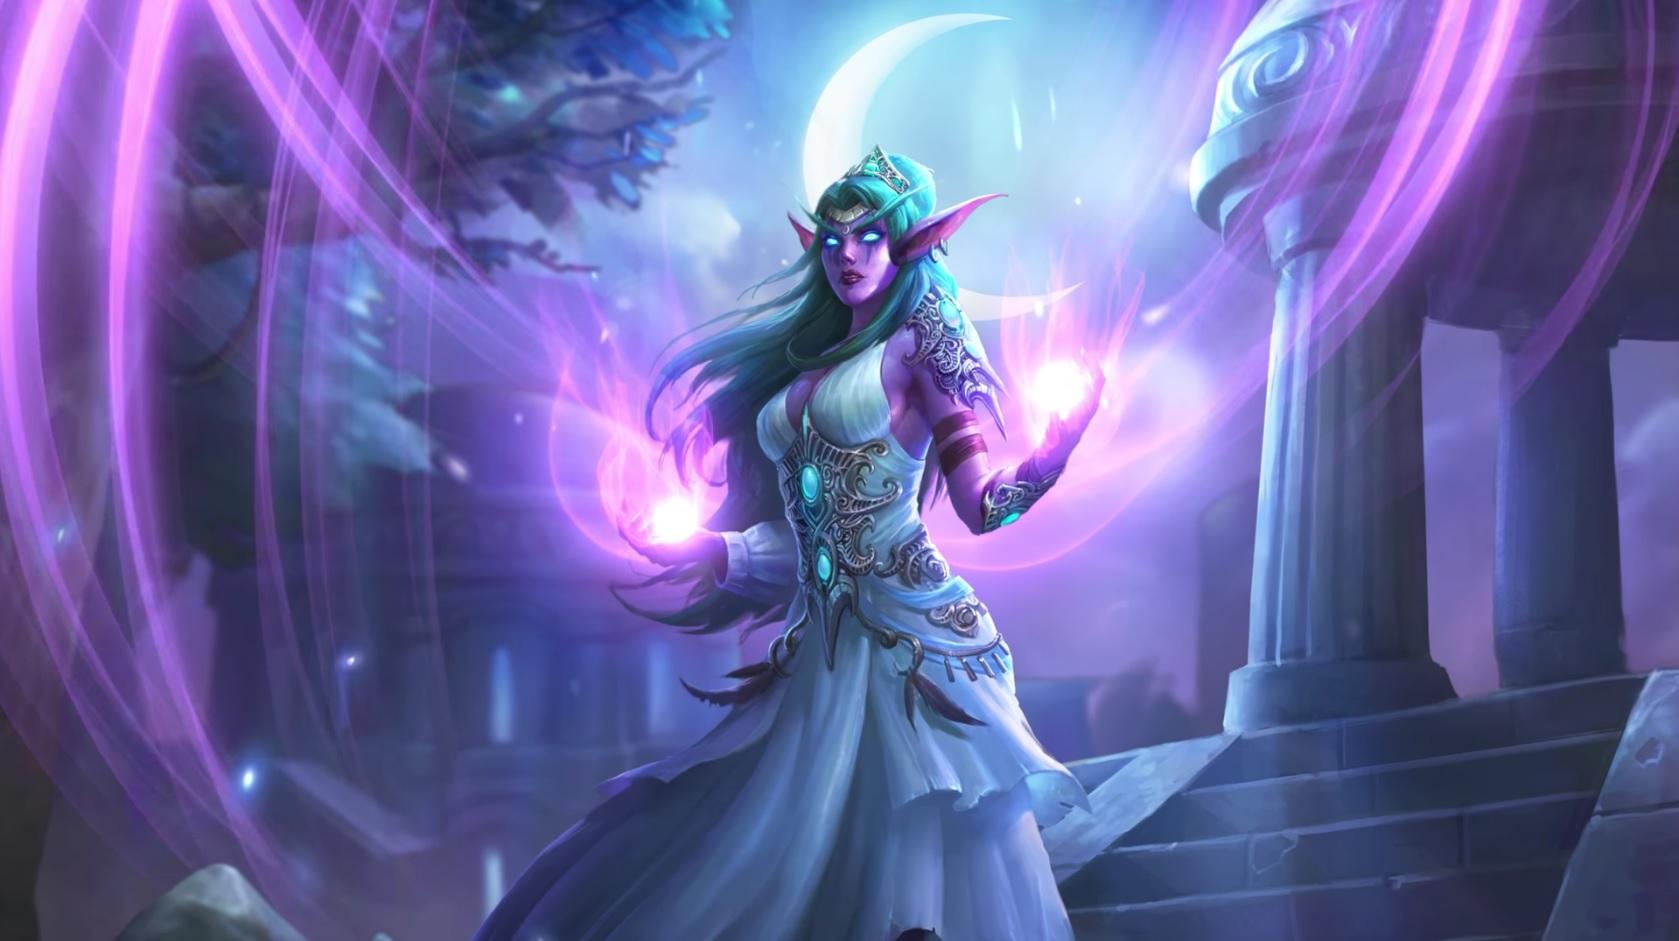 Blood elf and night elf threesome in whorecraft vr - 3 part 2